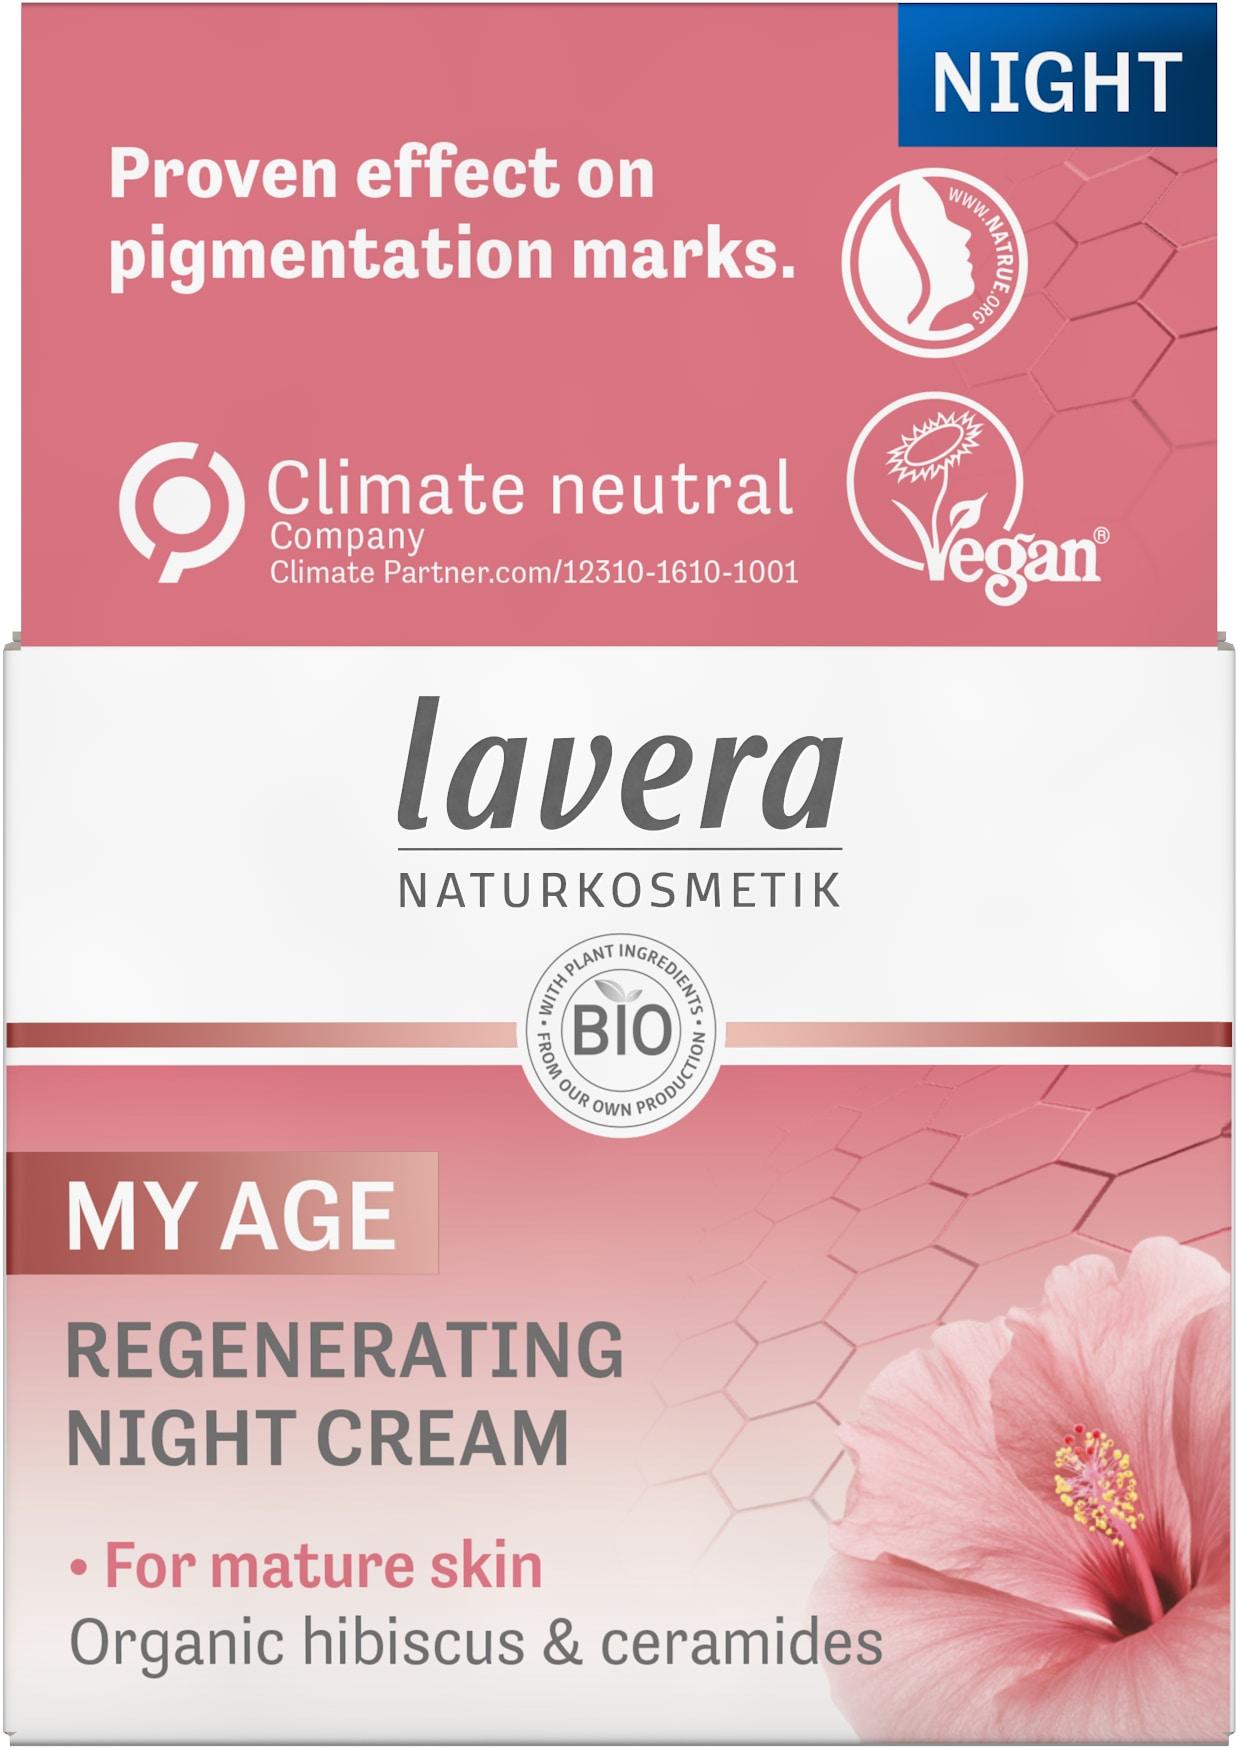 MY AGE Regenerating Night Cream